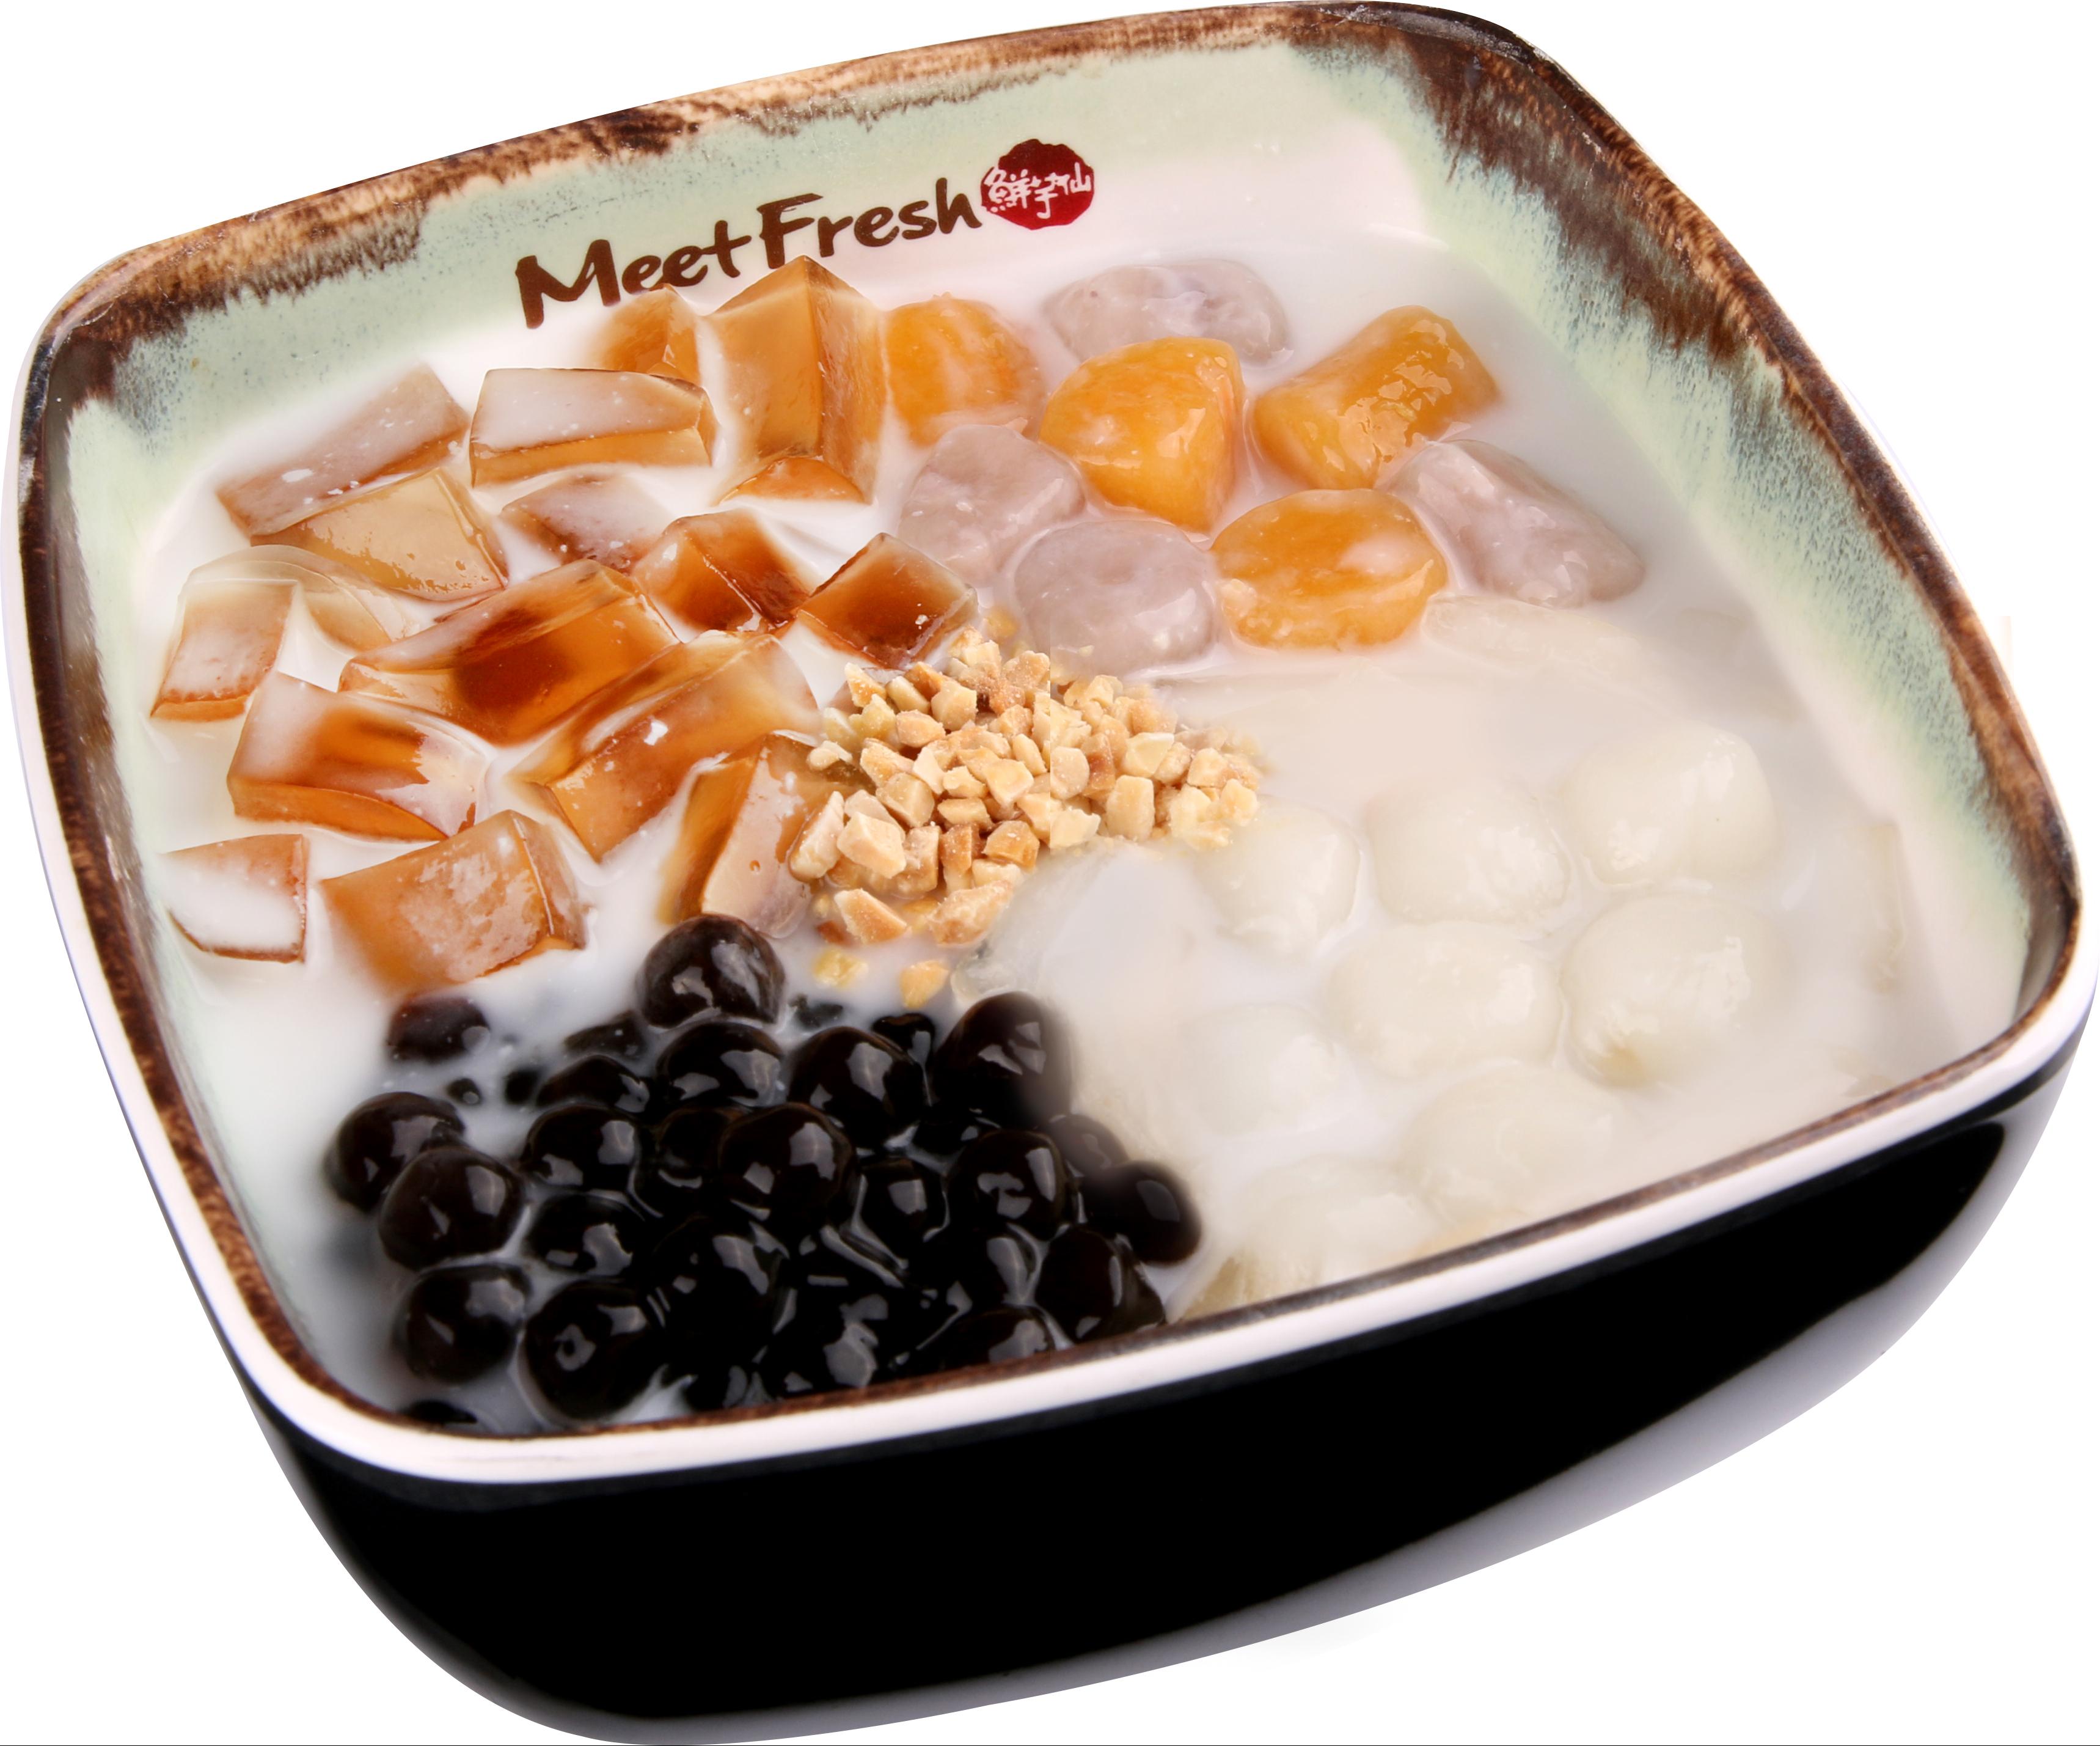 Hot Almond Soup Combo C, Melon Jelly, Rice Balls, Boba, Taro Balls, Almond Flakes, Hot Almond Soup